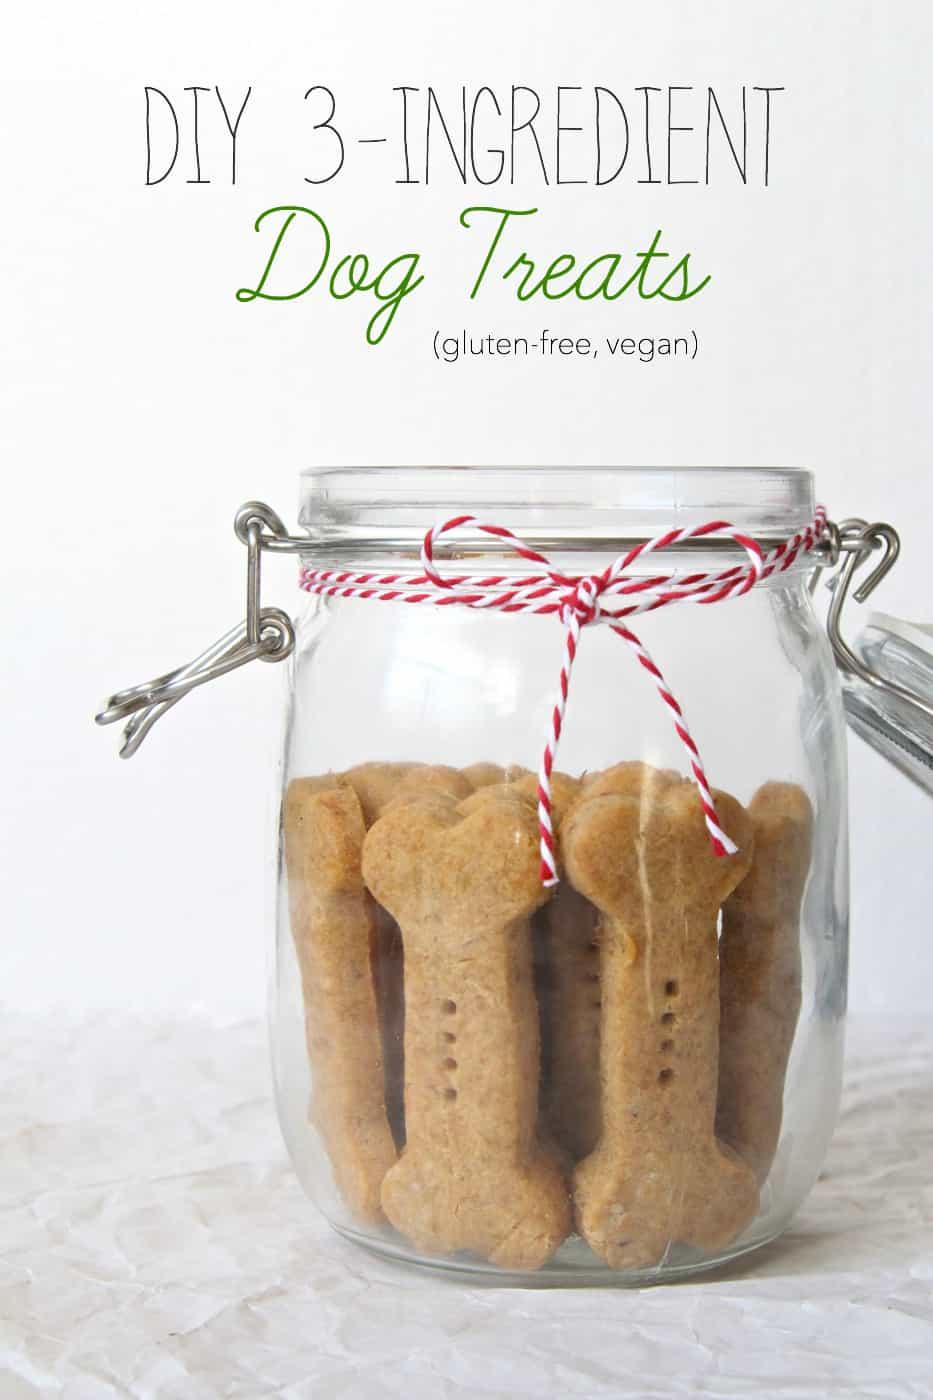 Diy 3 ingredient dog treats gluten free vegan the plant strong vegan title